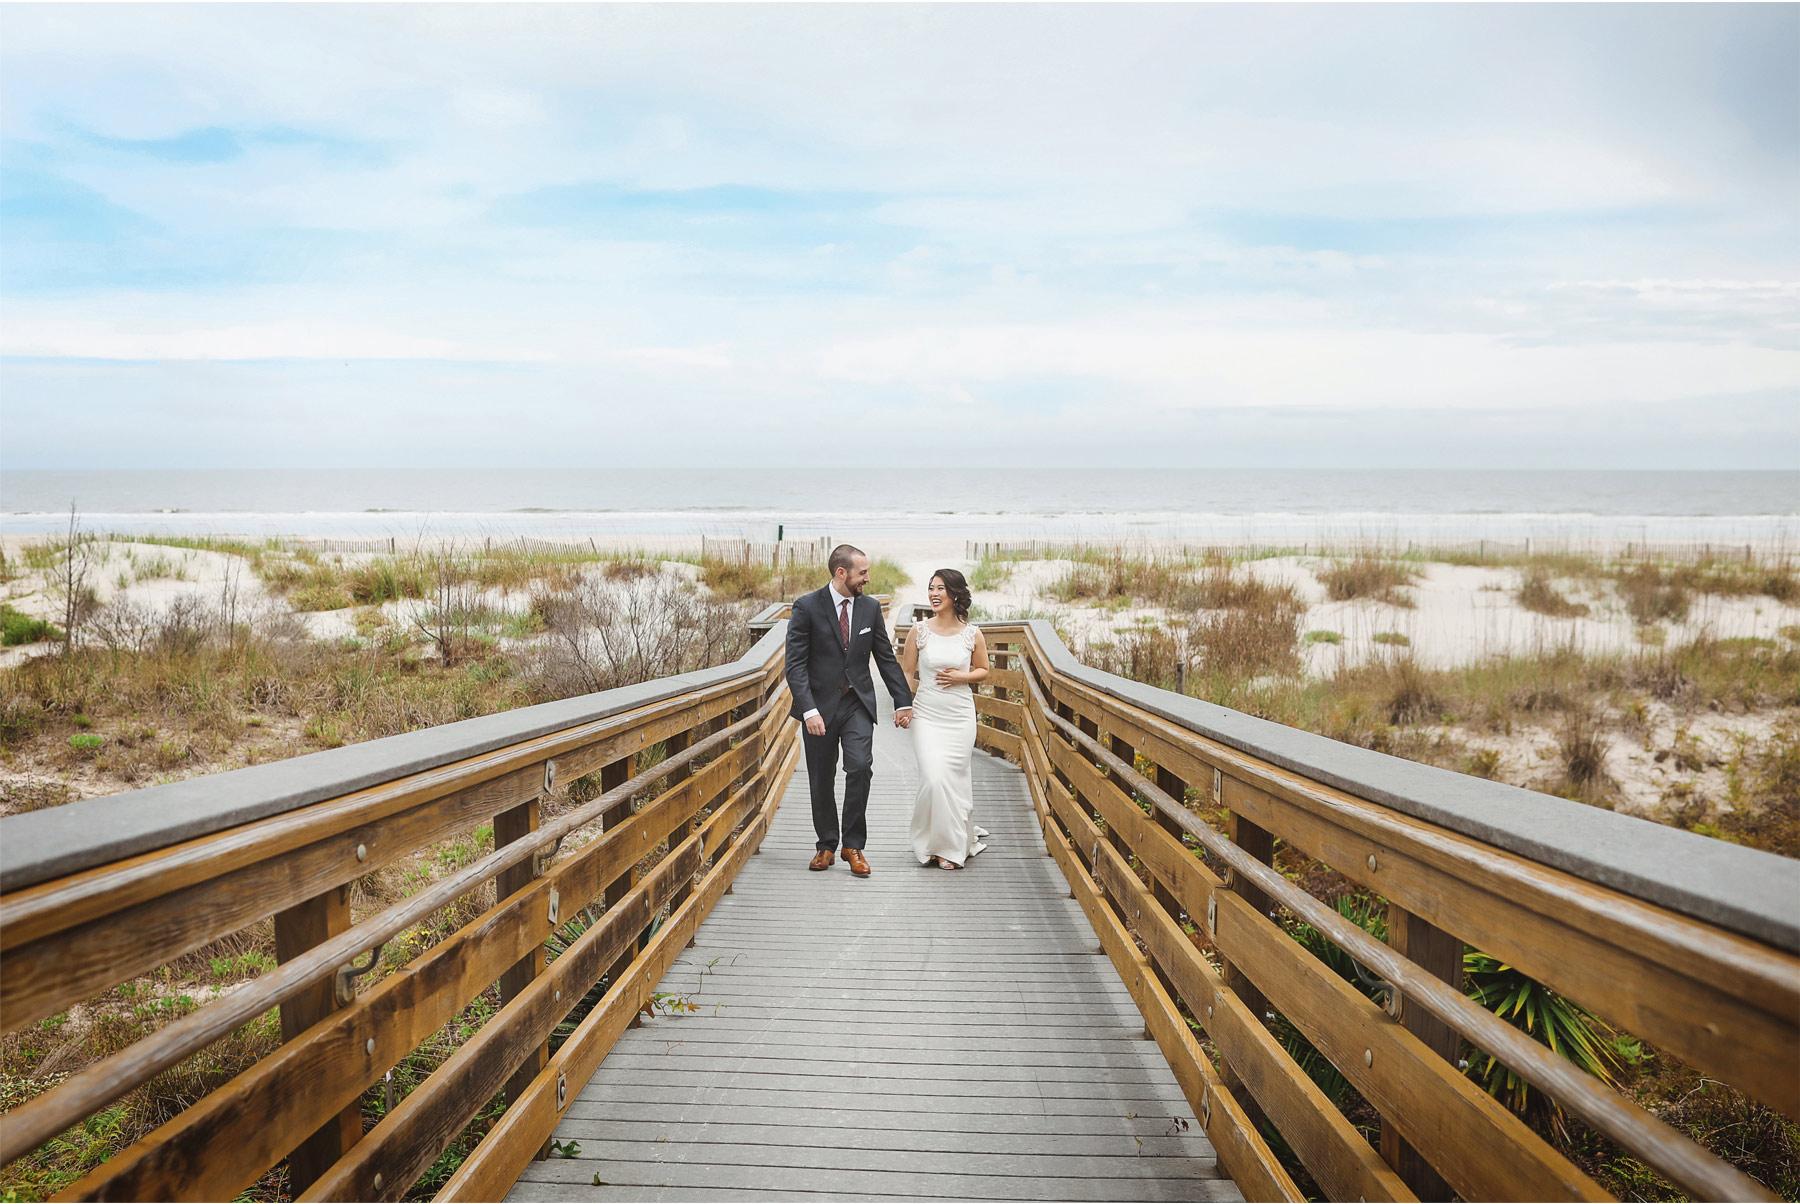 10-South-Carolina-Wedding-by-Vick-Photography-Hilton-Head-Island-Omni-Oceanfront-Hotel-Destination-First-Look-Beach-Ocean-Boardwalk-Tropical-Felyn-and-Will.jpg